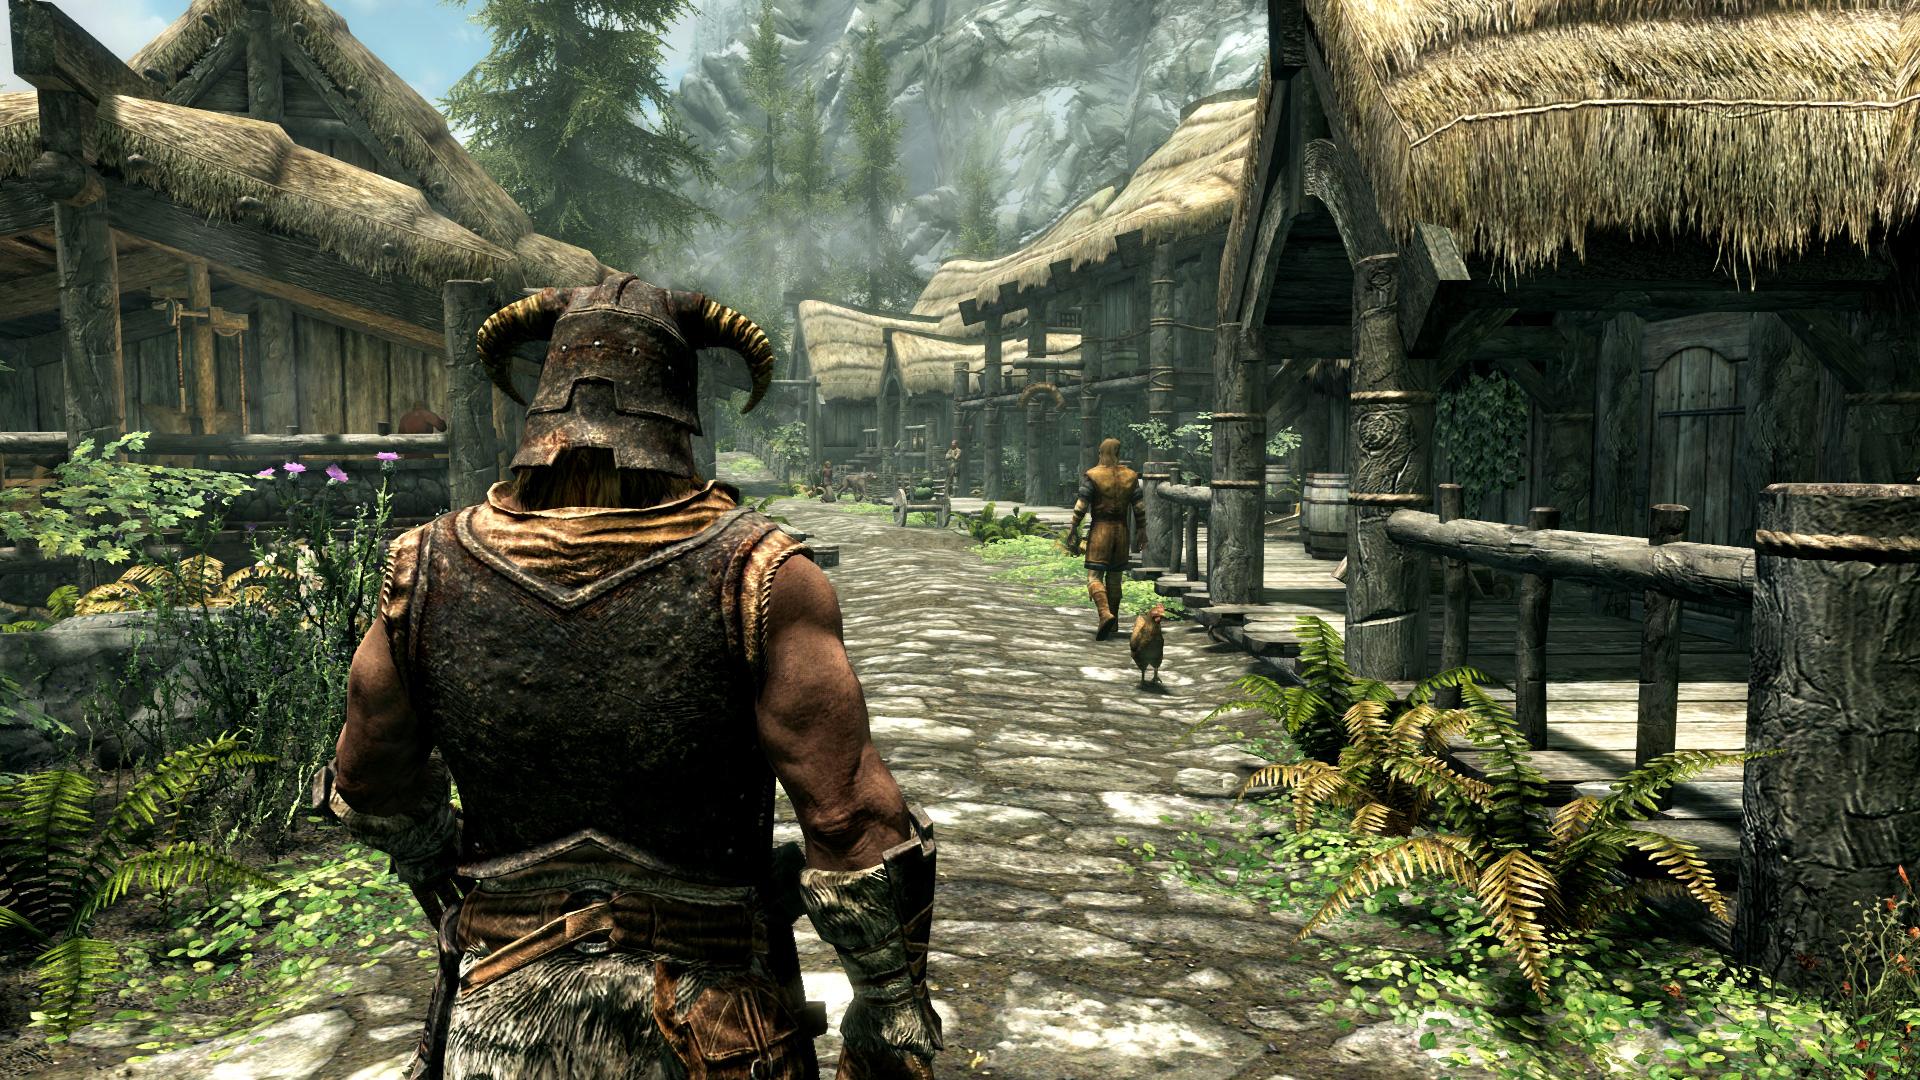 Okradanie biednych - serie The Elder Scrolls i Fallout